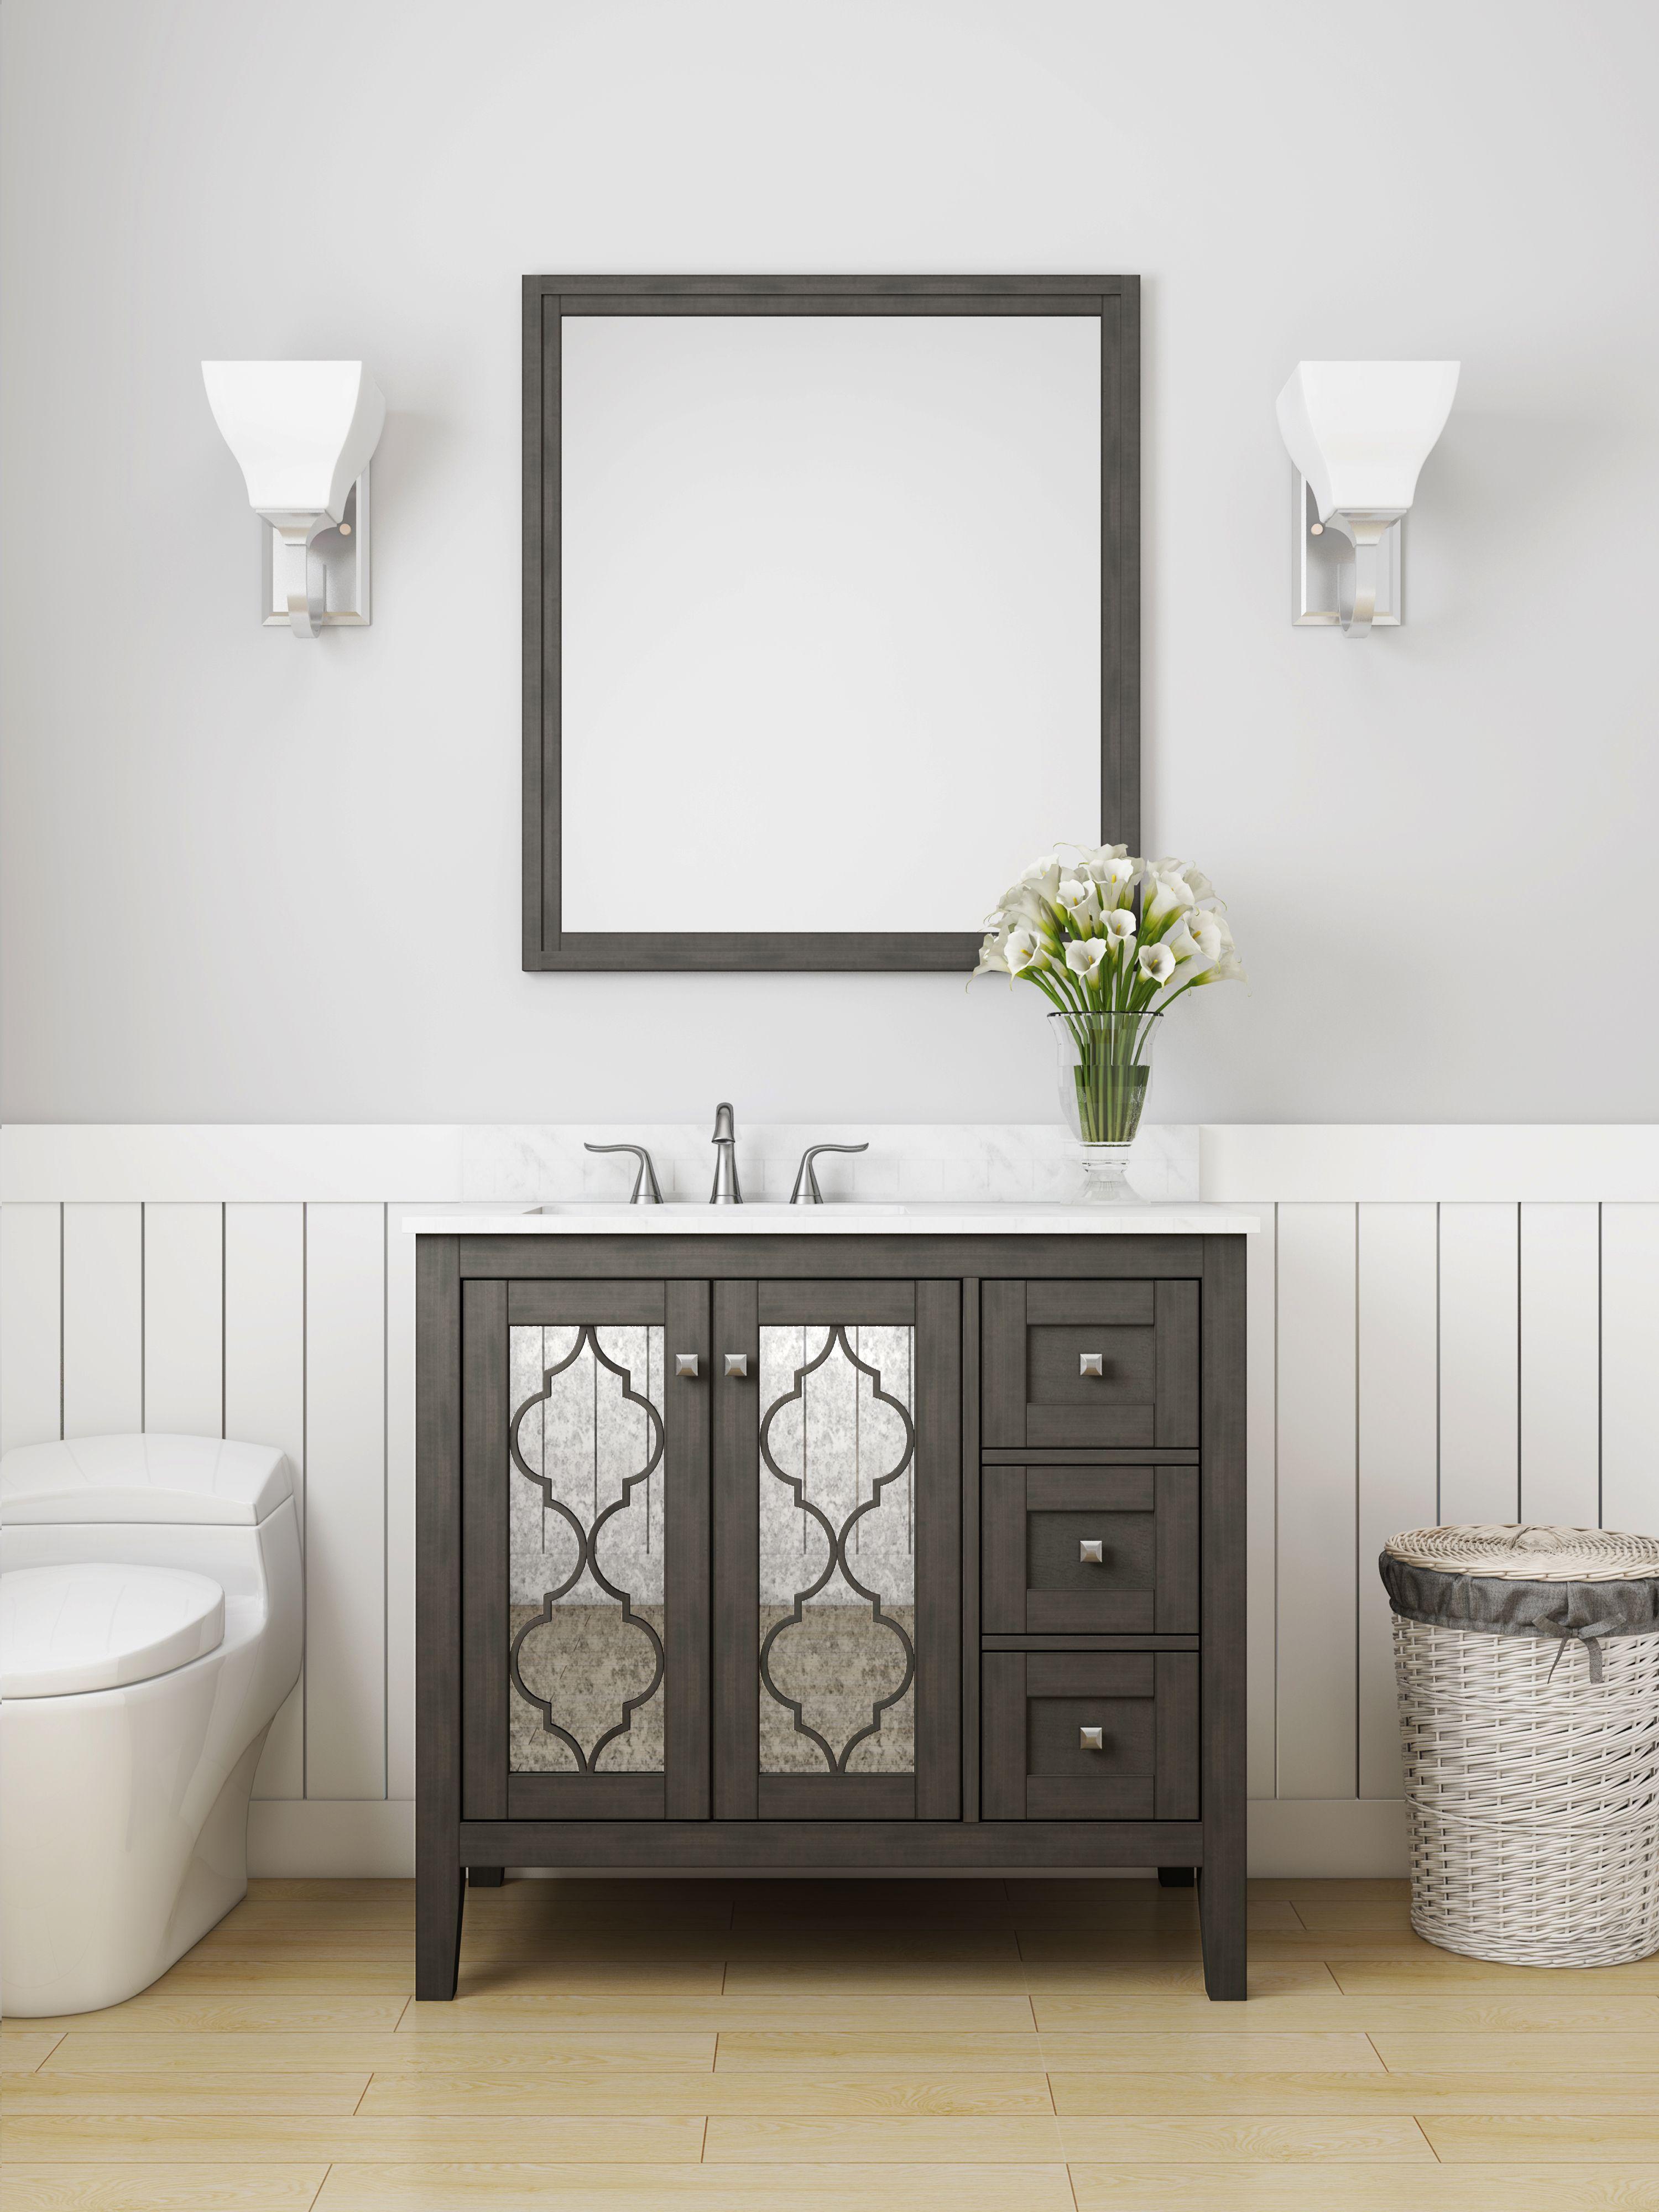 Allen + roth Everdene 36-in Grey Single Sink Bathroom Vanity